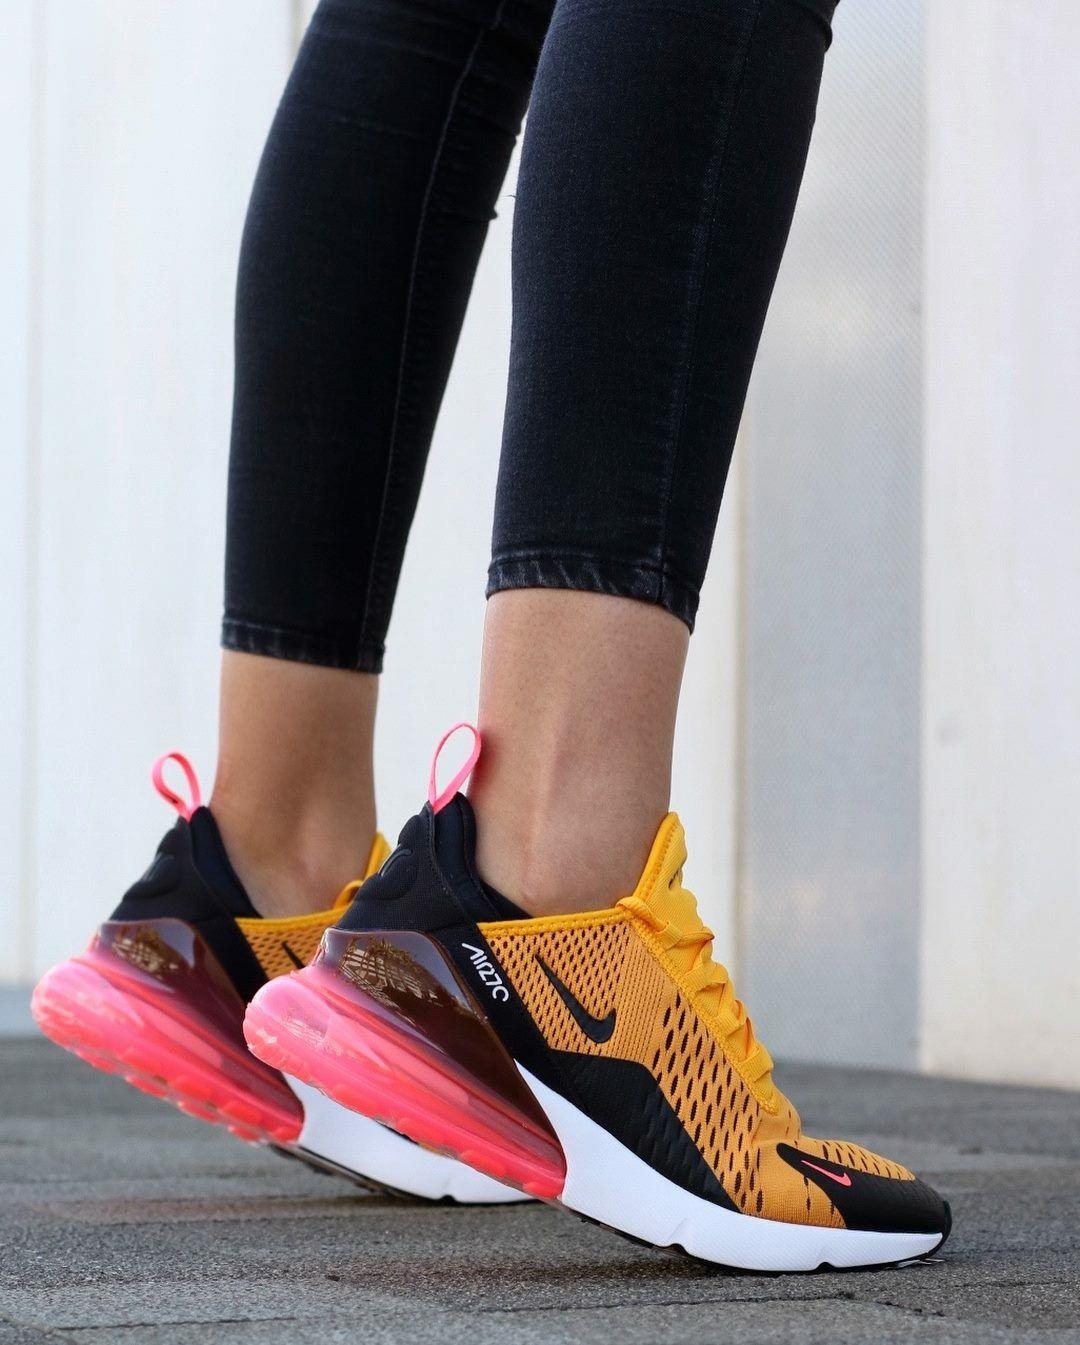 Fashion Shoes on | Sapatilhas nike, Tenis sapato e Nike air max